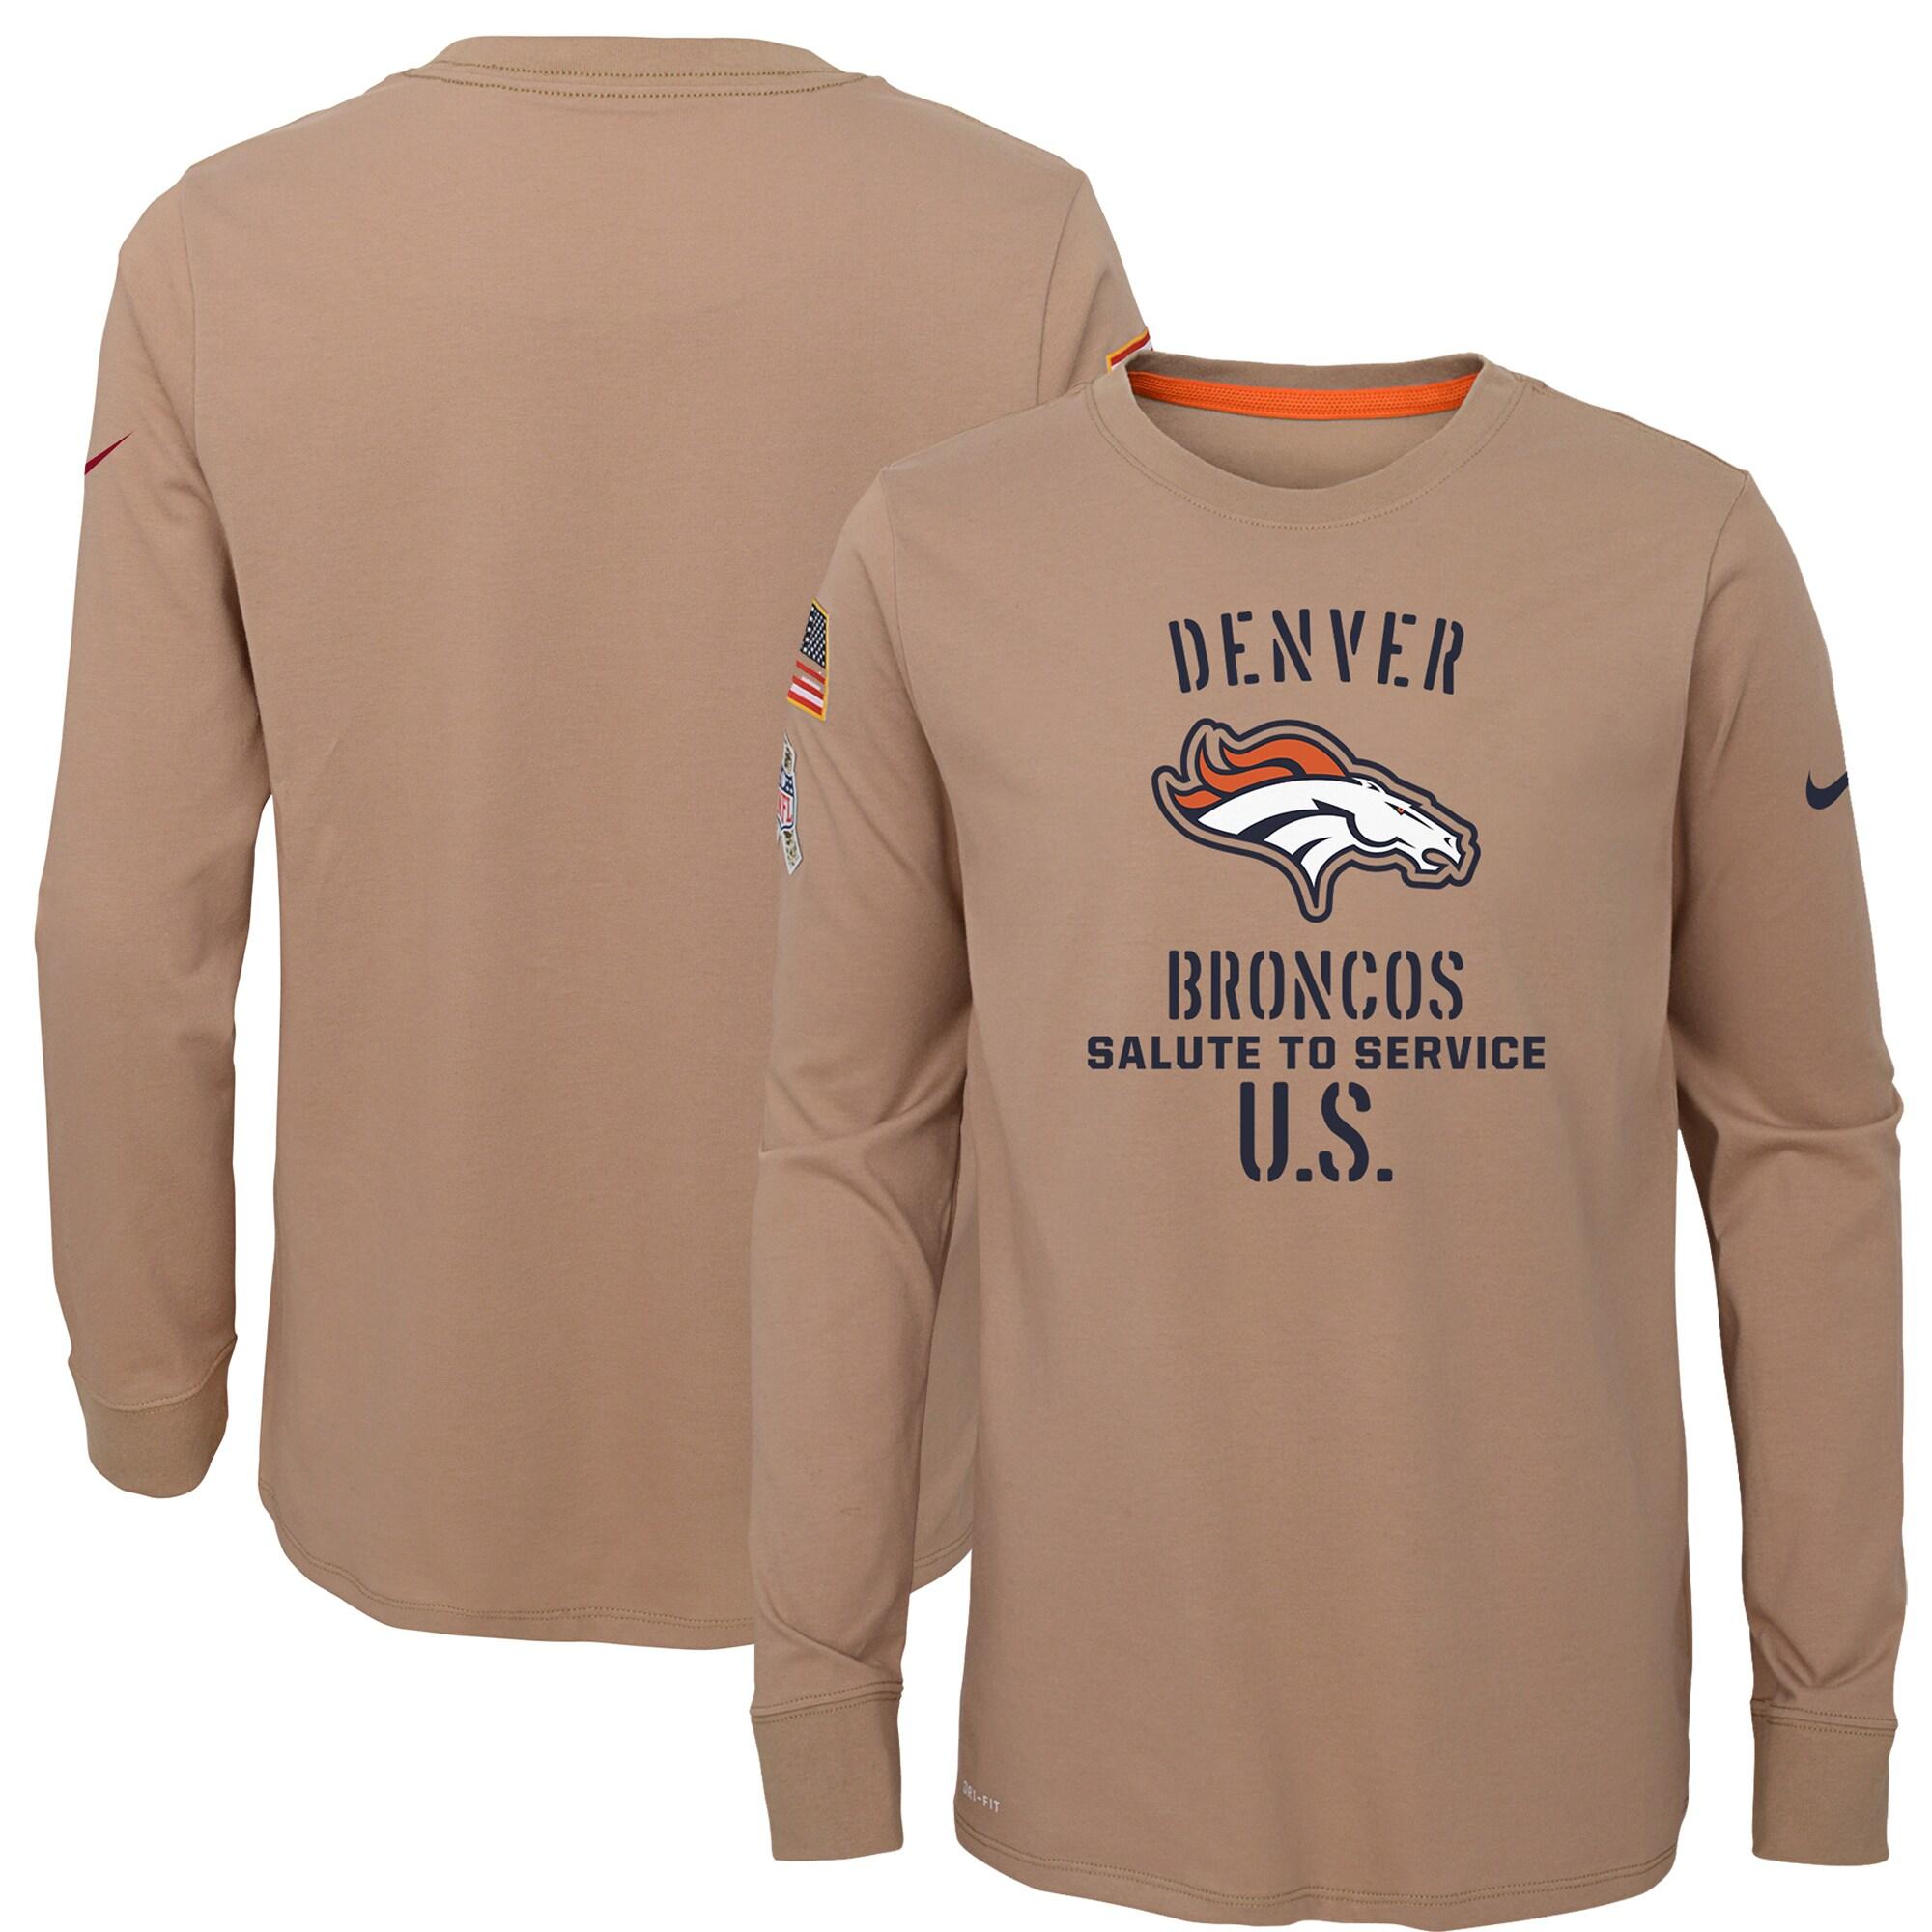 Denver Broncos Nike Youth 2019 Salute to Service Performance Long Sleeve T-Shirt - Khaki